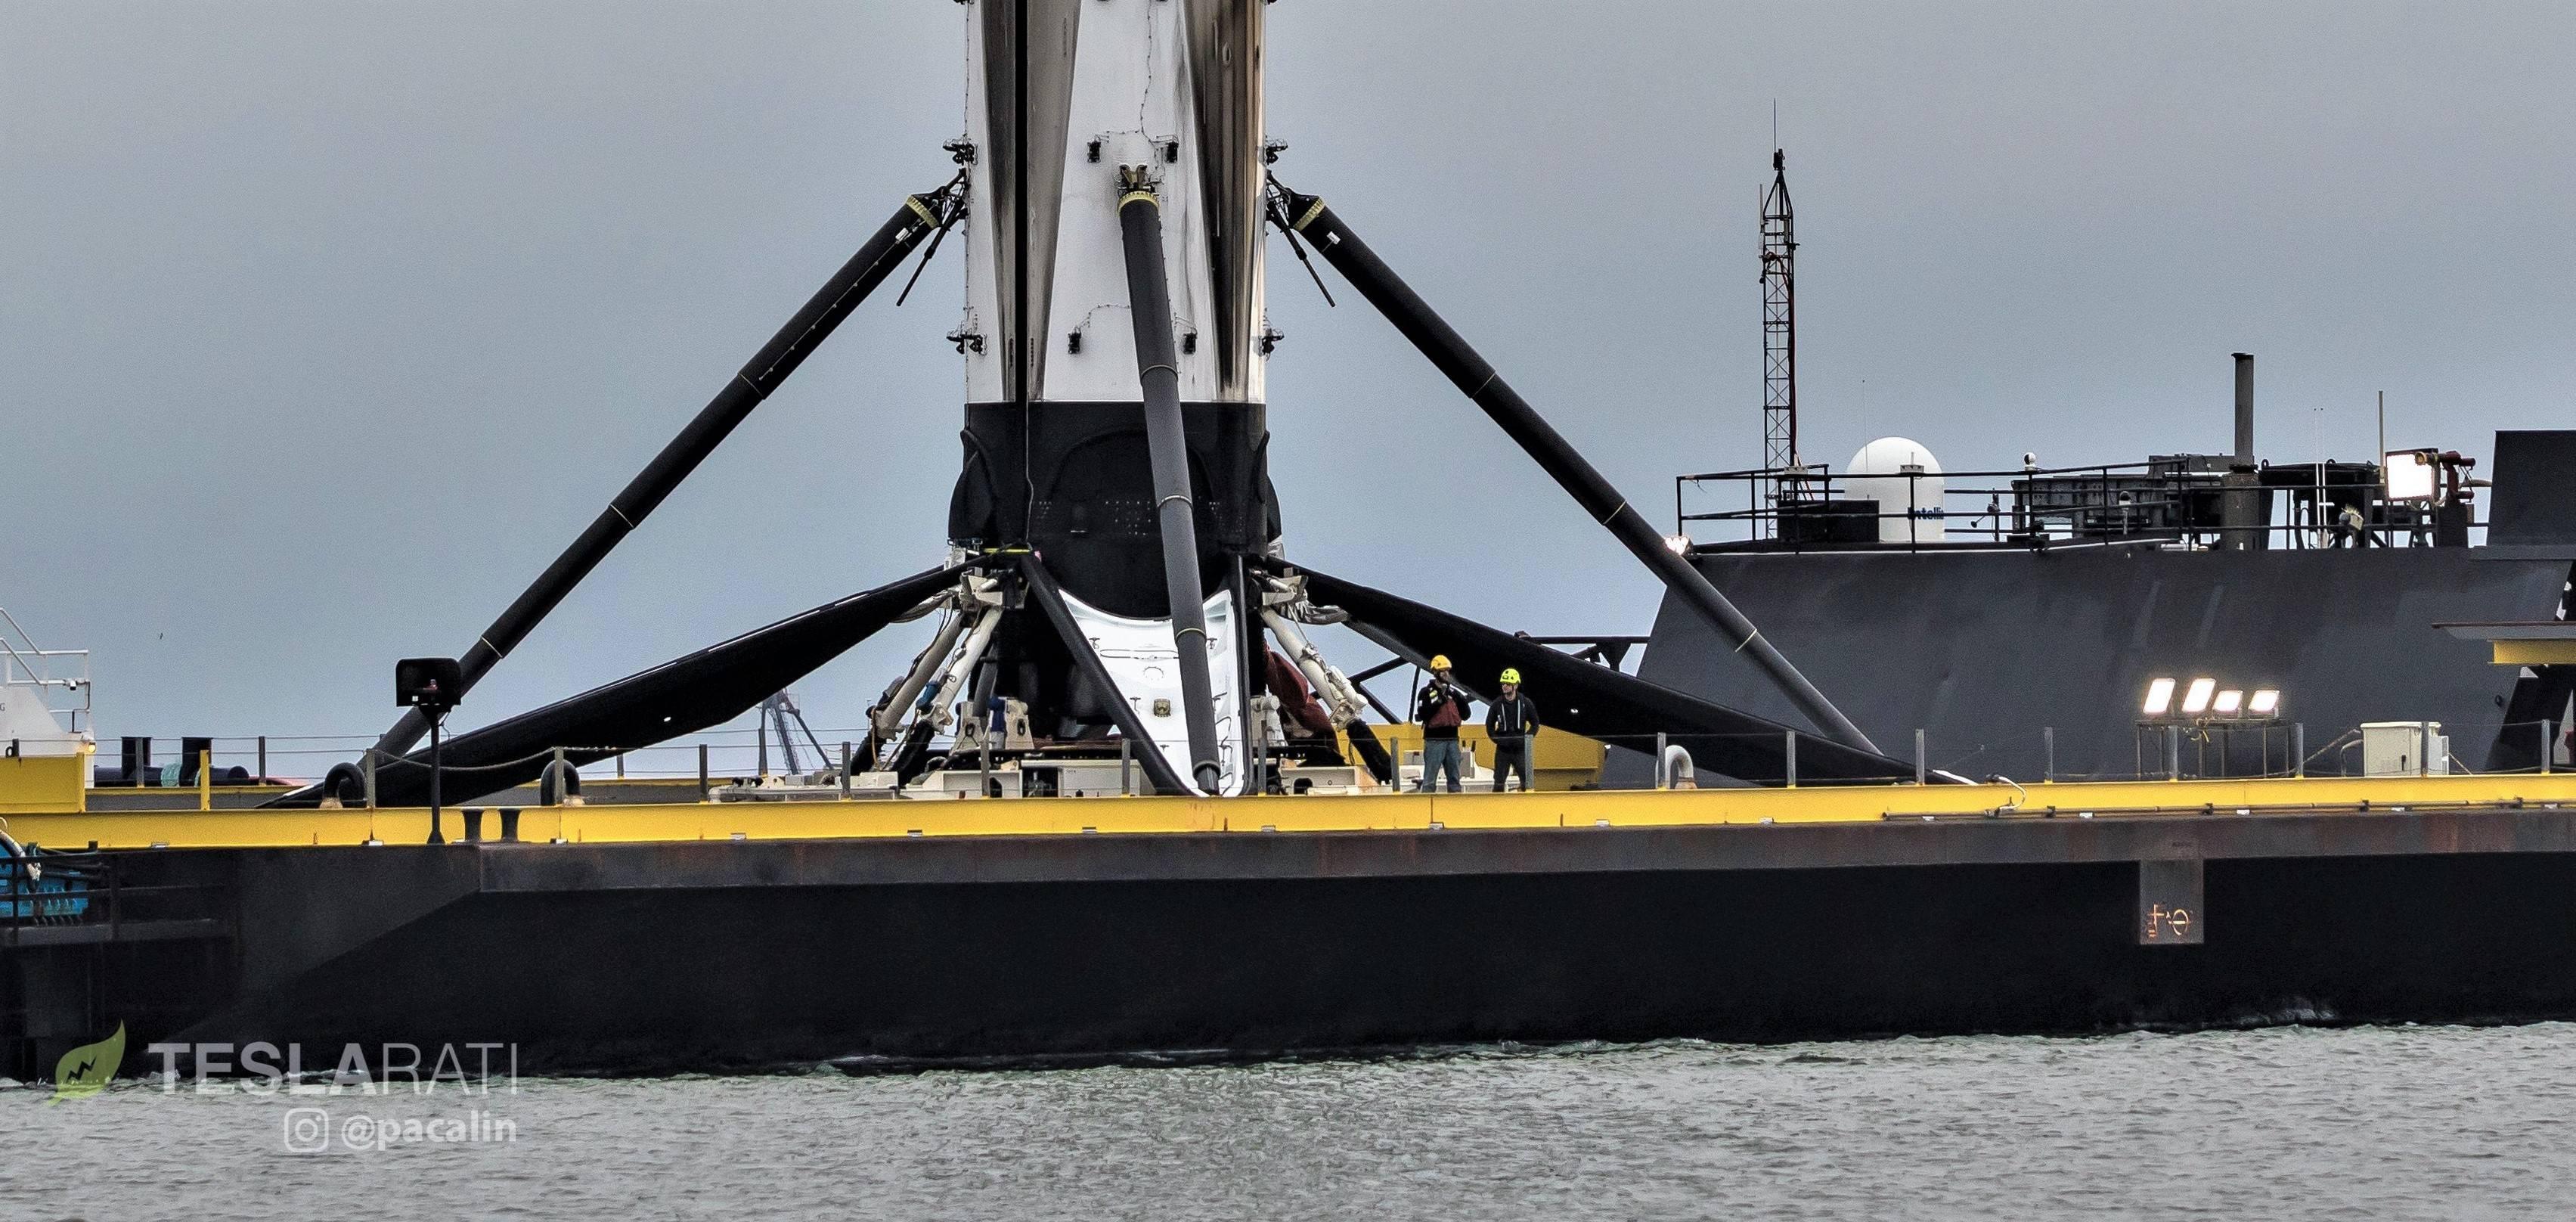 Falcon 9 B1051 DM-1 OCISLY recovery 030519 (Pauline Acalin) 12 crop (c)